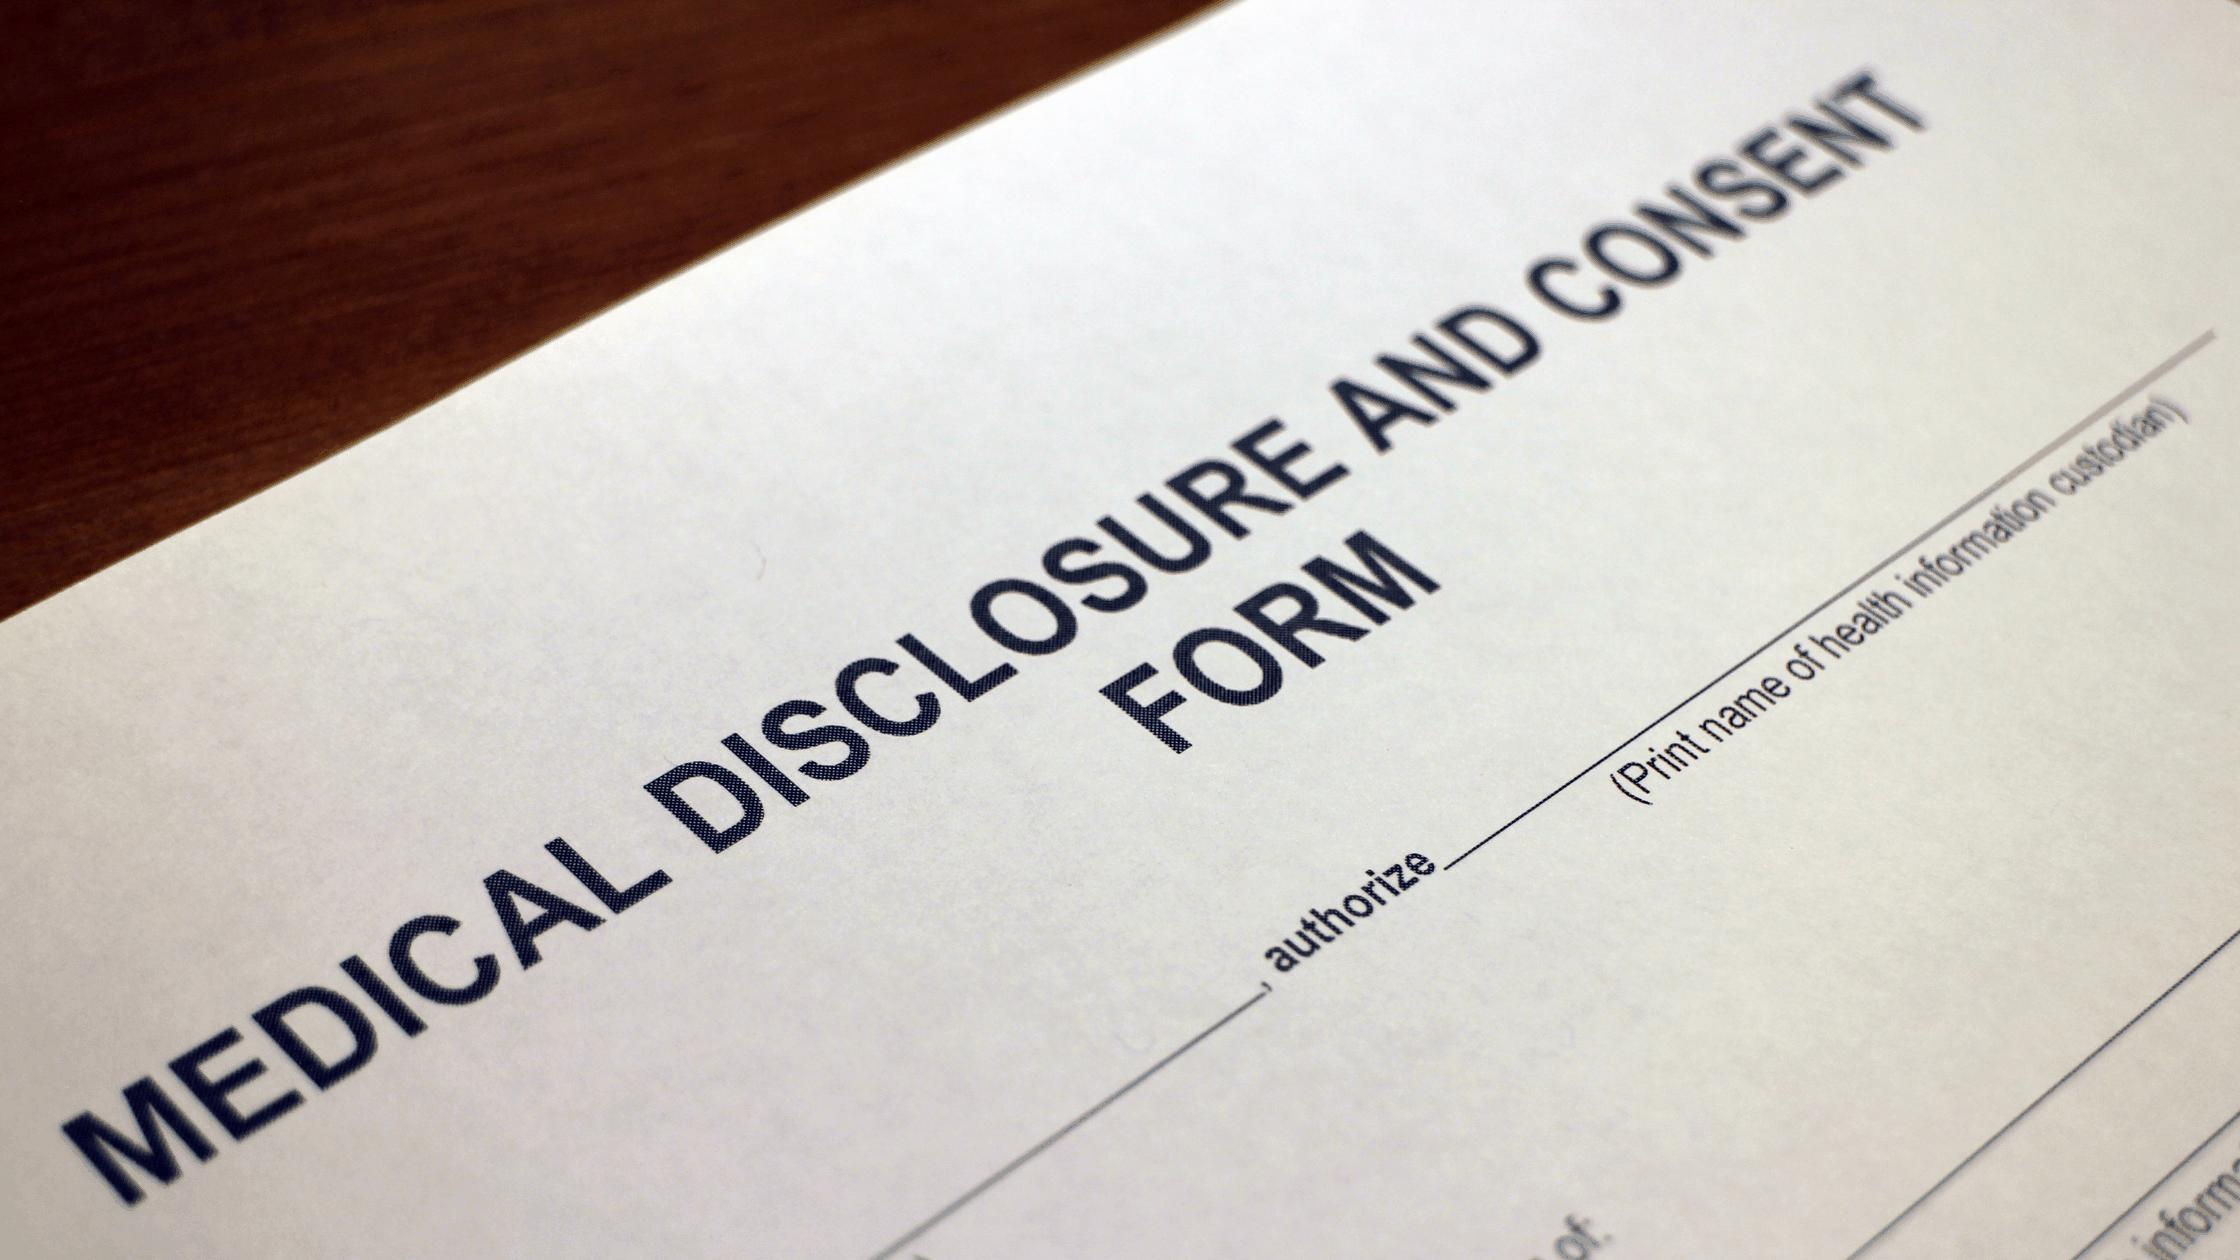 Informed consent translations (4)